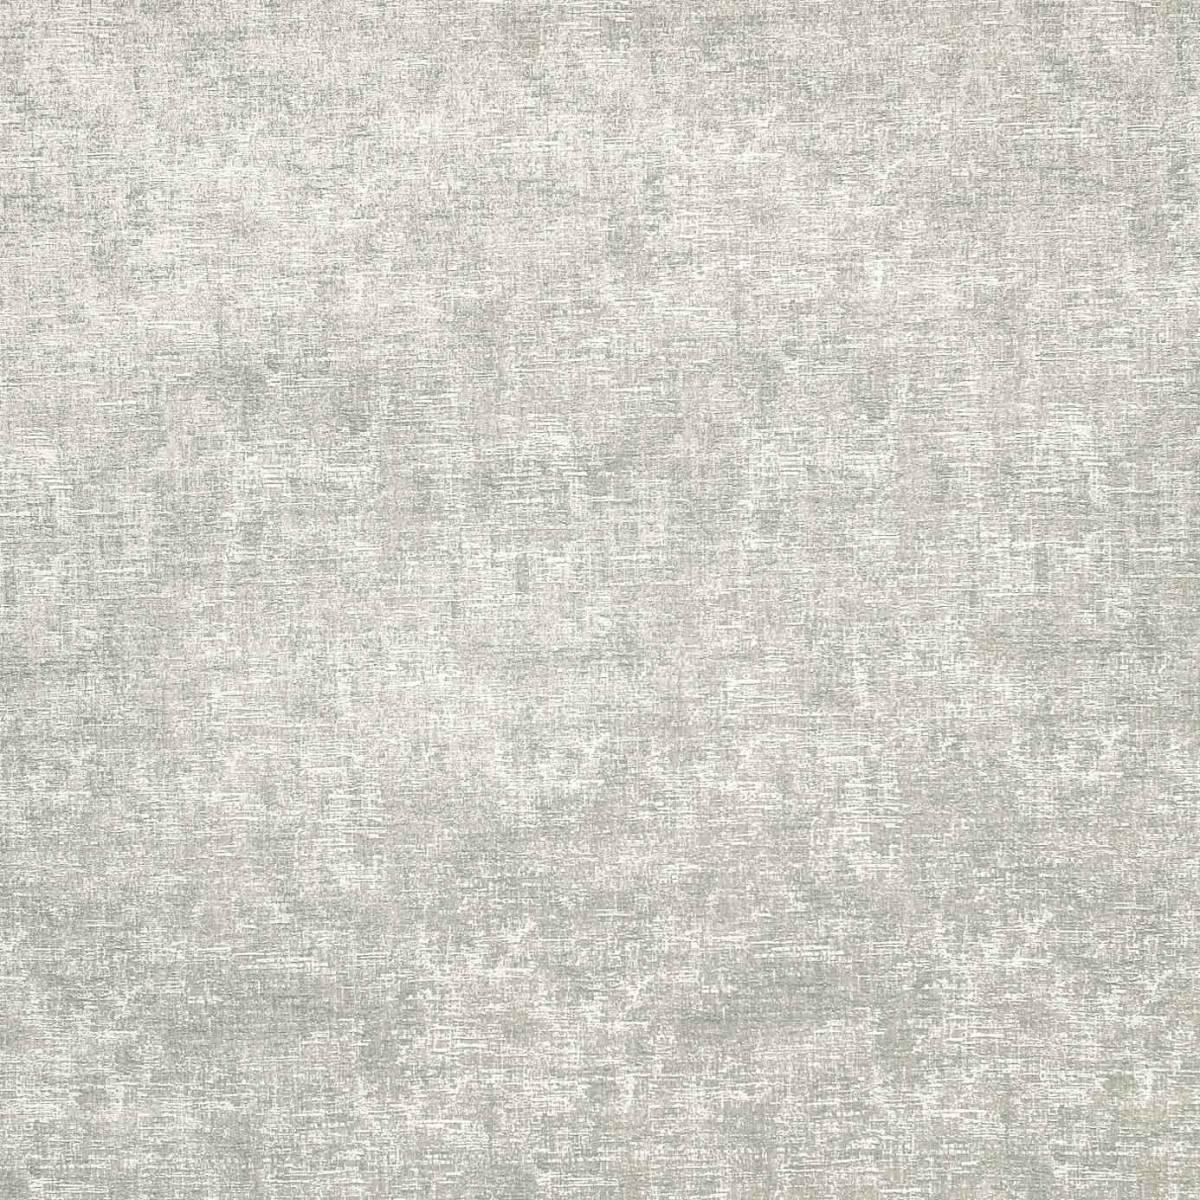 Arcadia Fabric Linen 3674 031 Prestigious Textiles